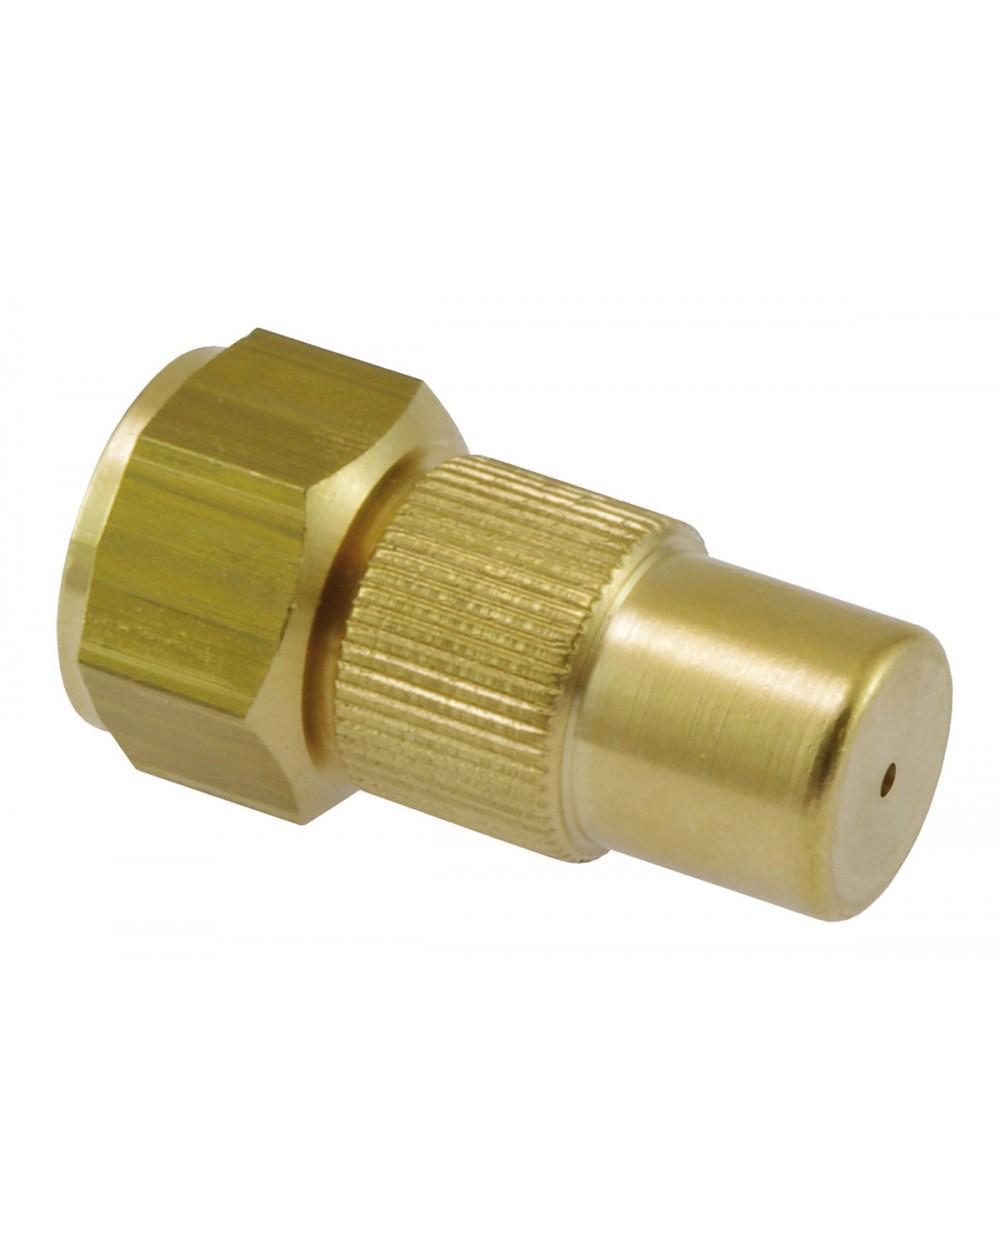 BUSE REGLABLE LAITON 1,3 mm